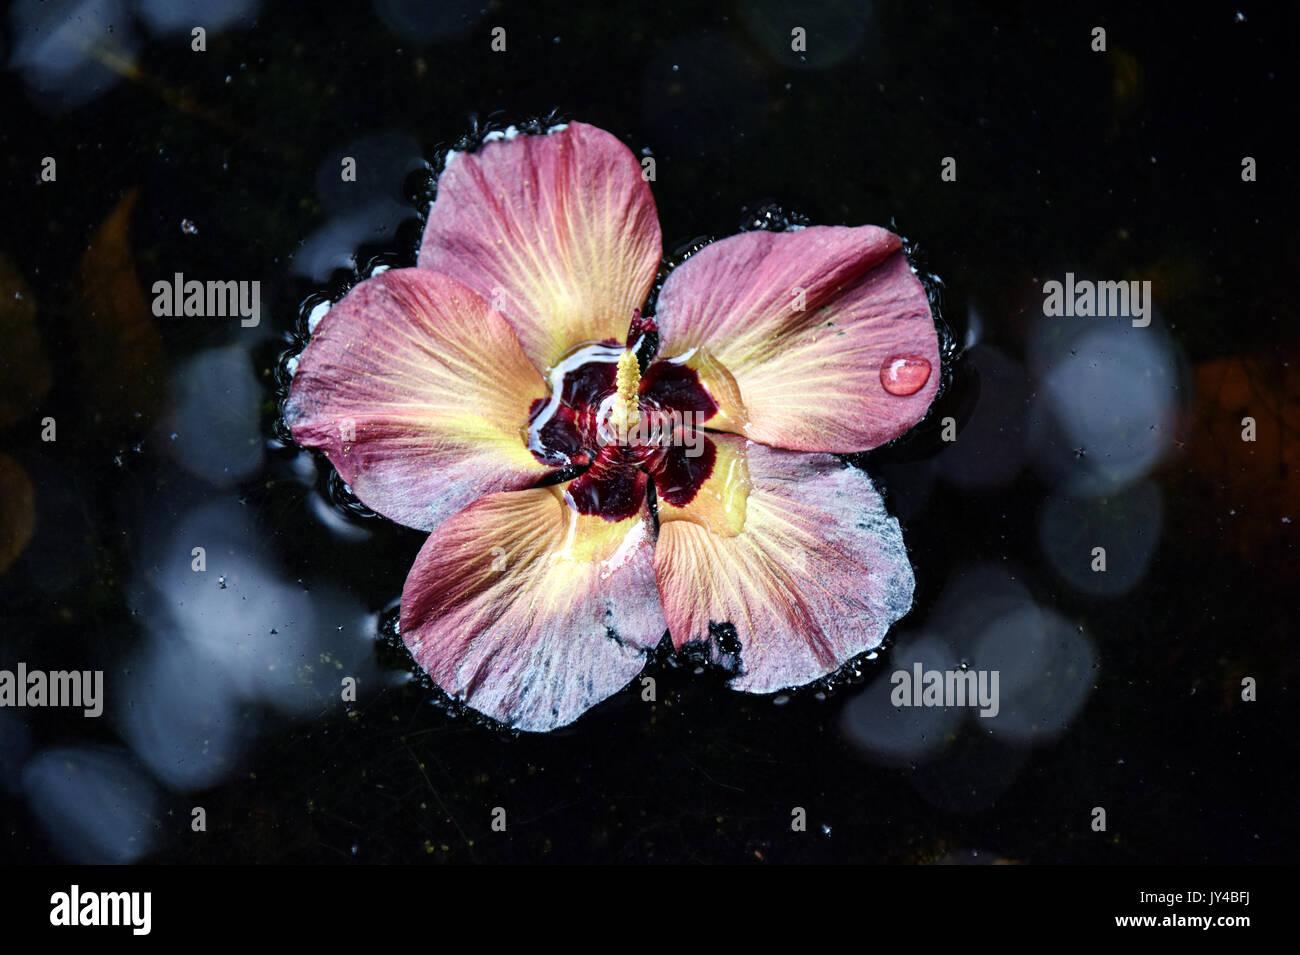 Hibiscus Flower In Water - Stock Image